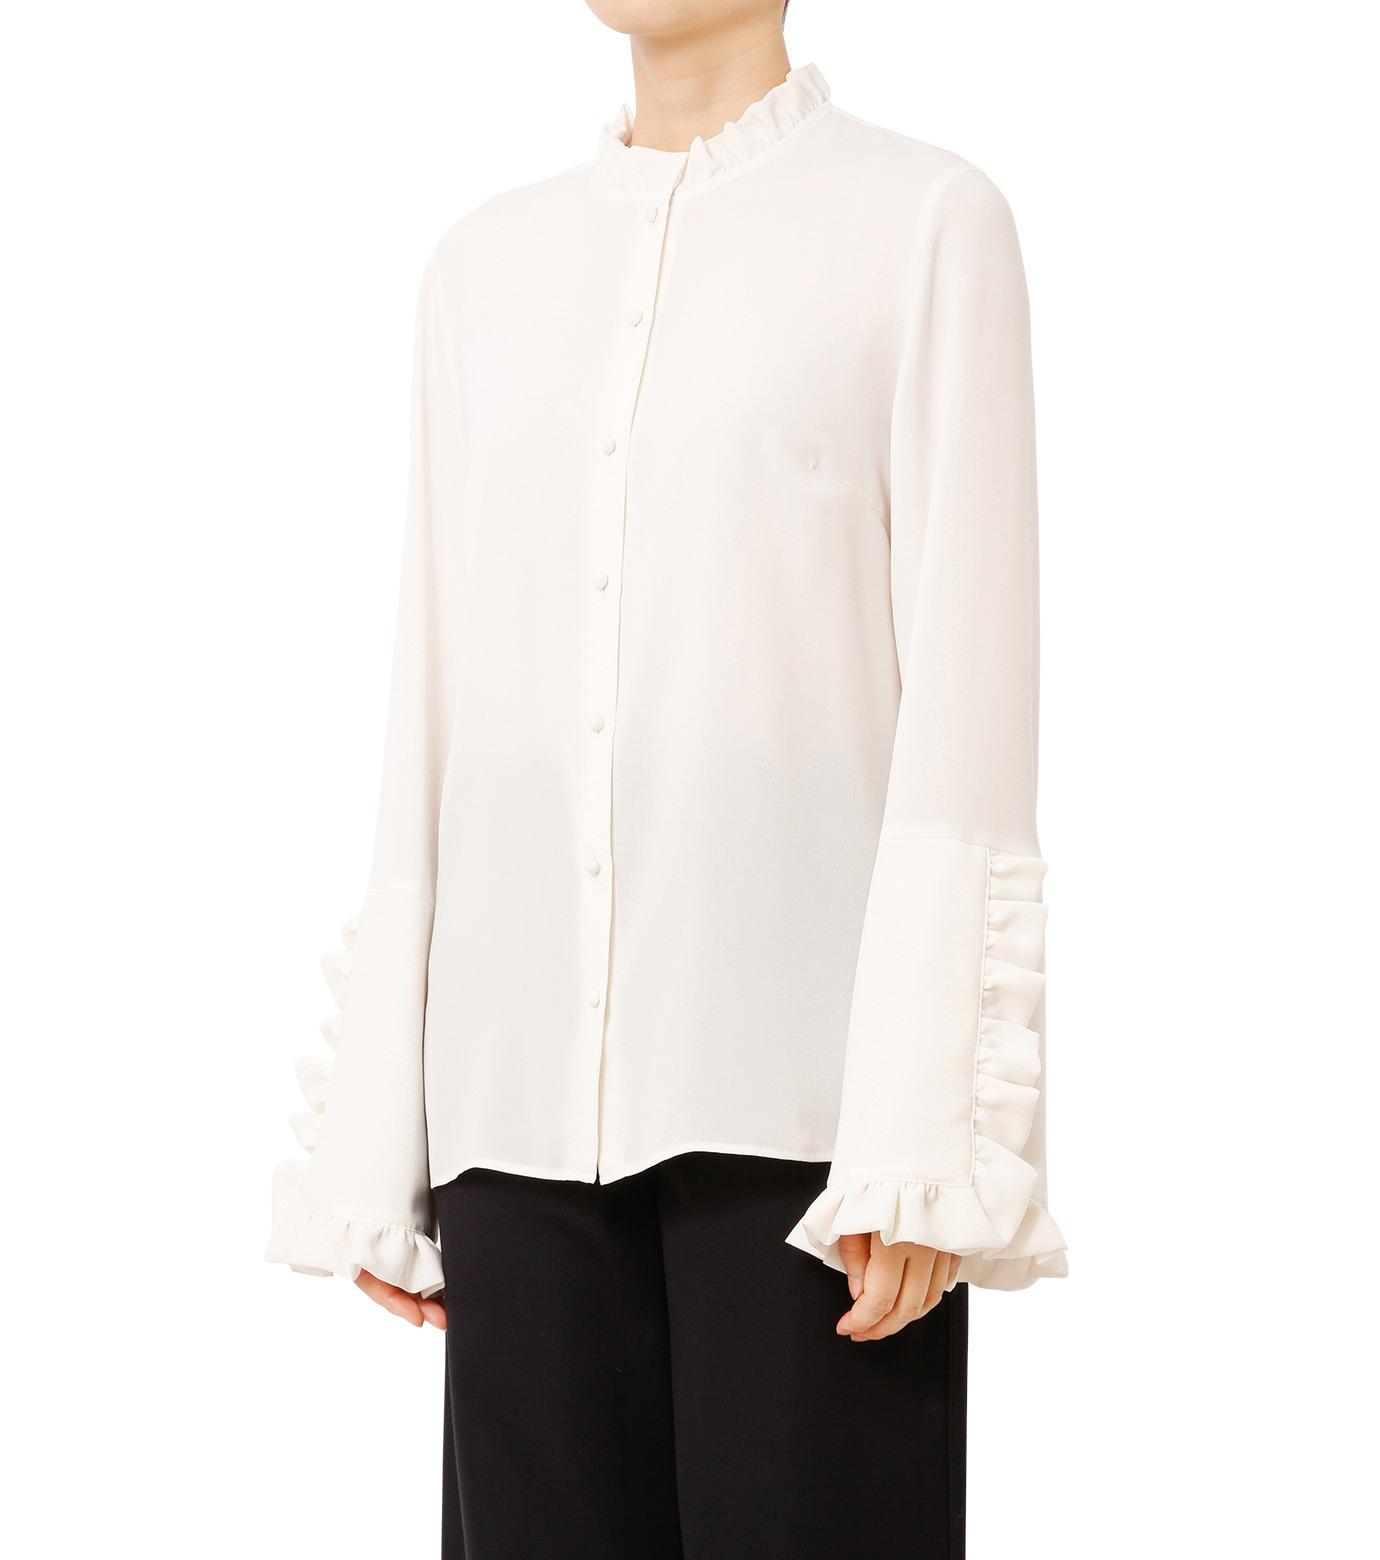 LE CIEL BLEU(ルシェルブルー)のフリルブラウス-WHITE(シャツ/shirt)-18A63416 拡大詳細画像1